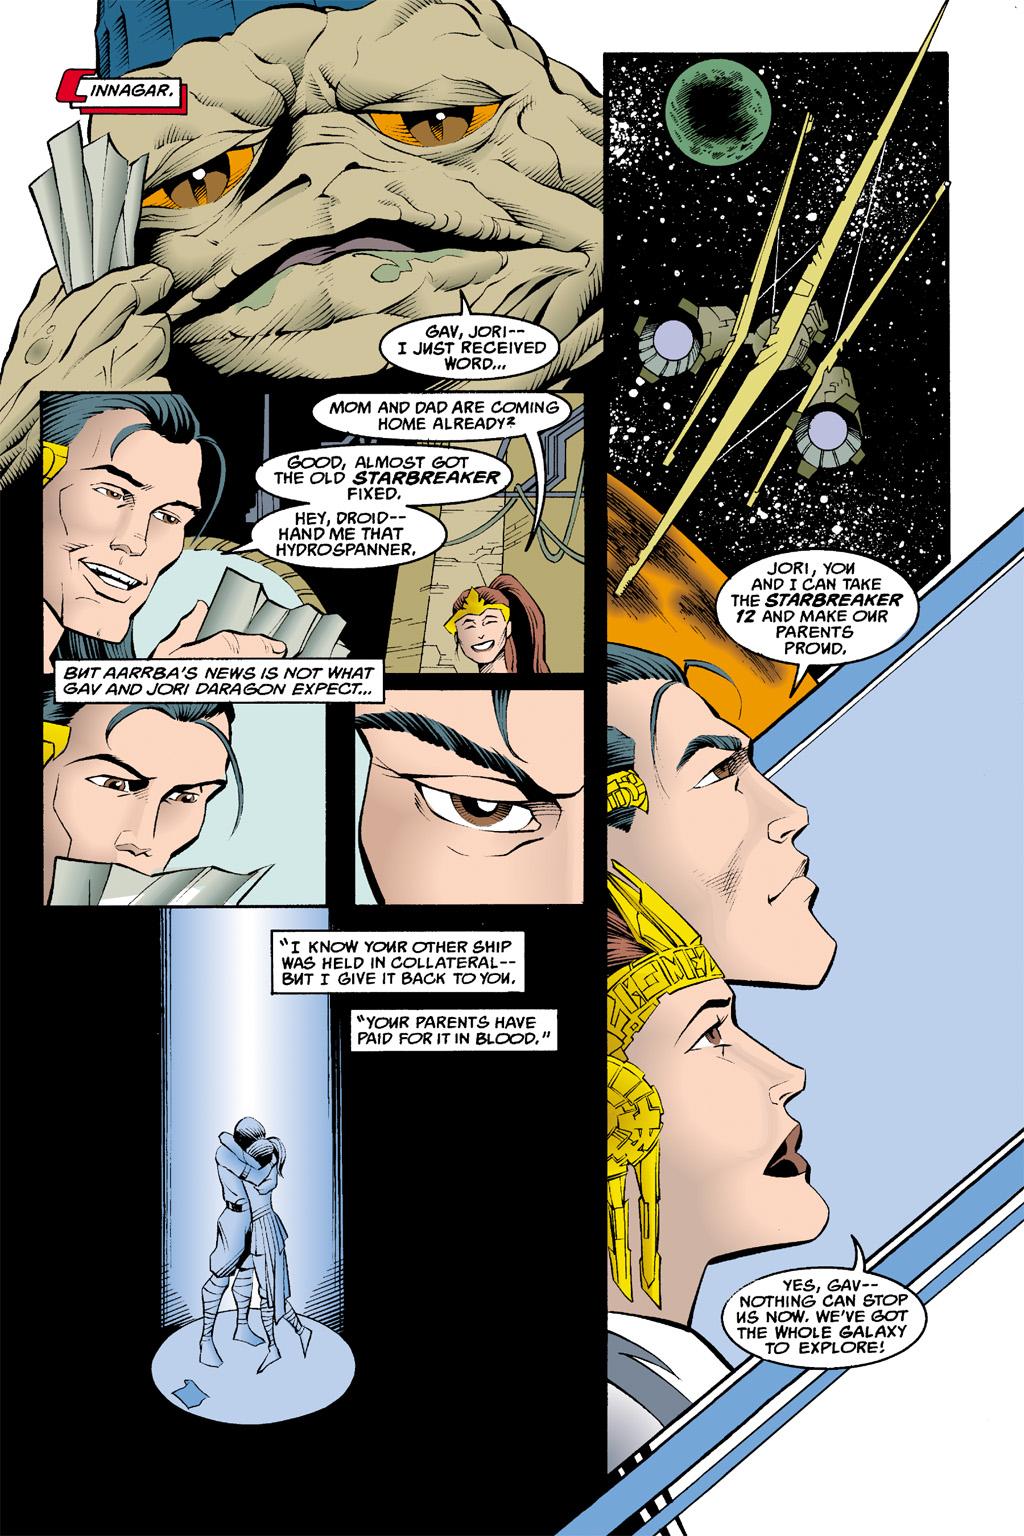 Read online Star Wars Omnibus comic -  Issue # Vol. 4 - 18